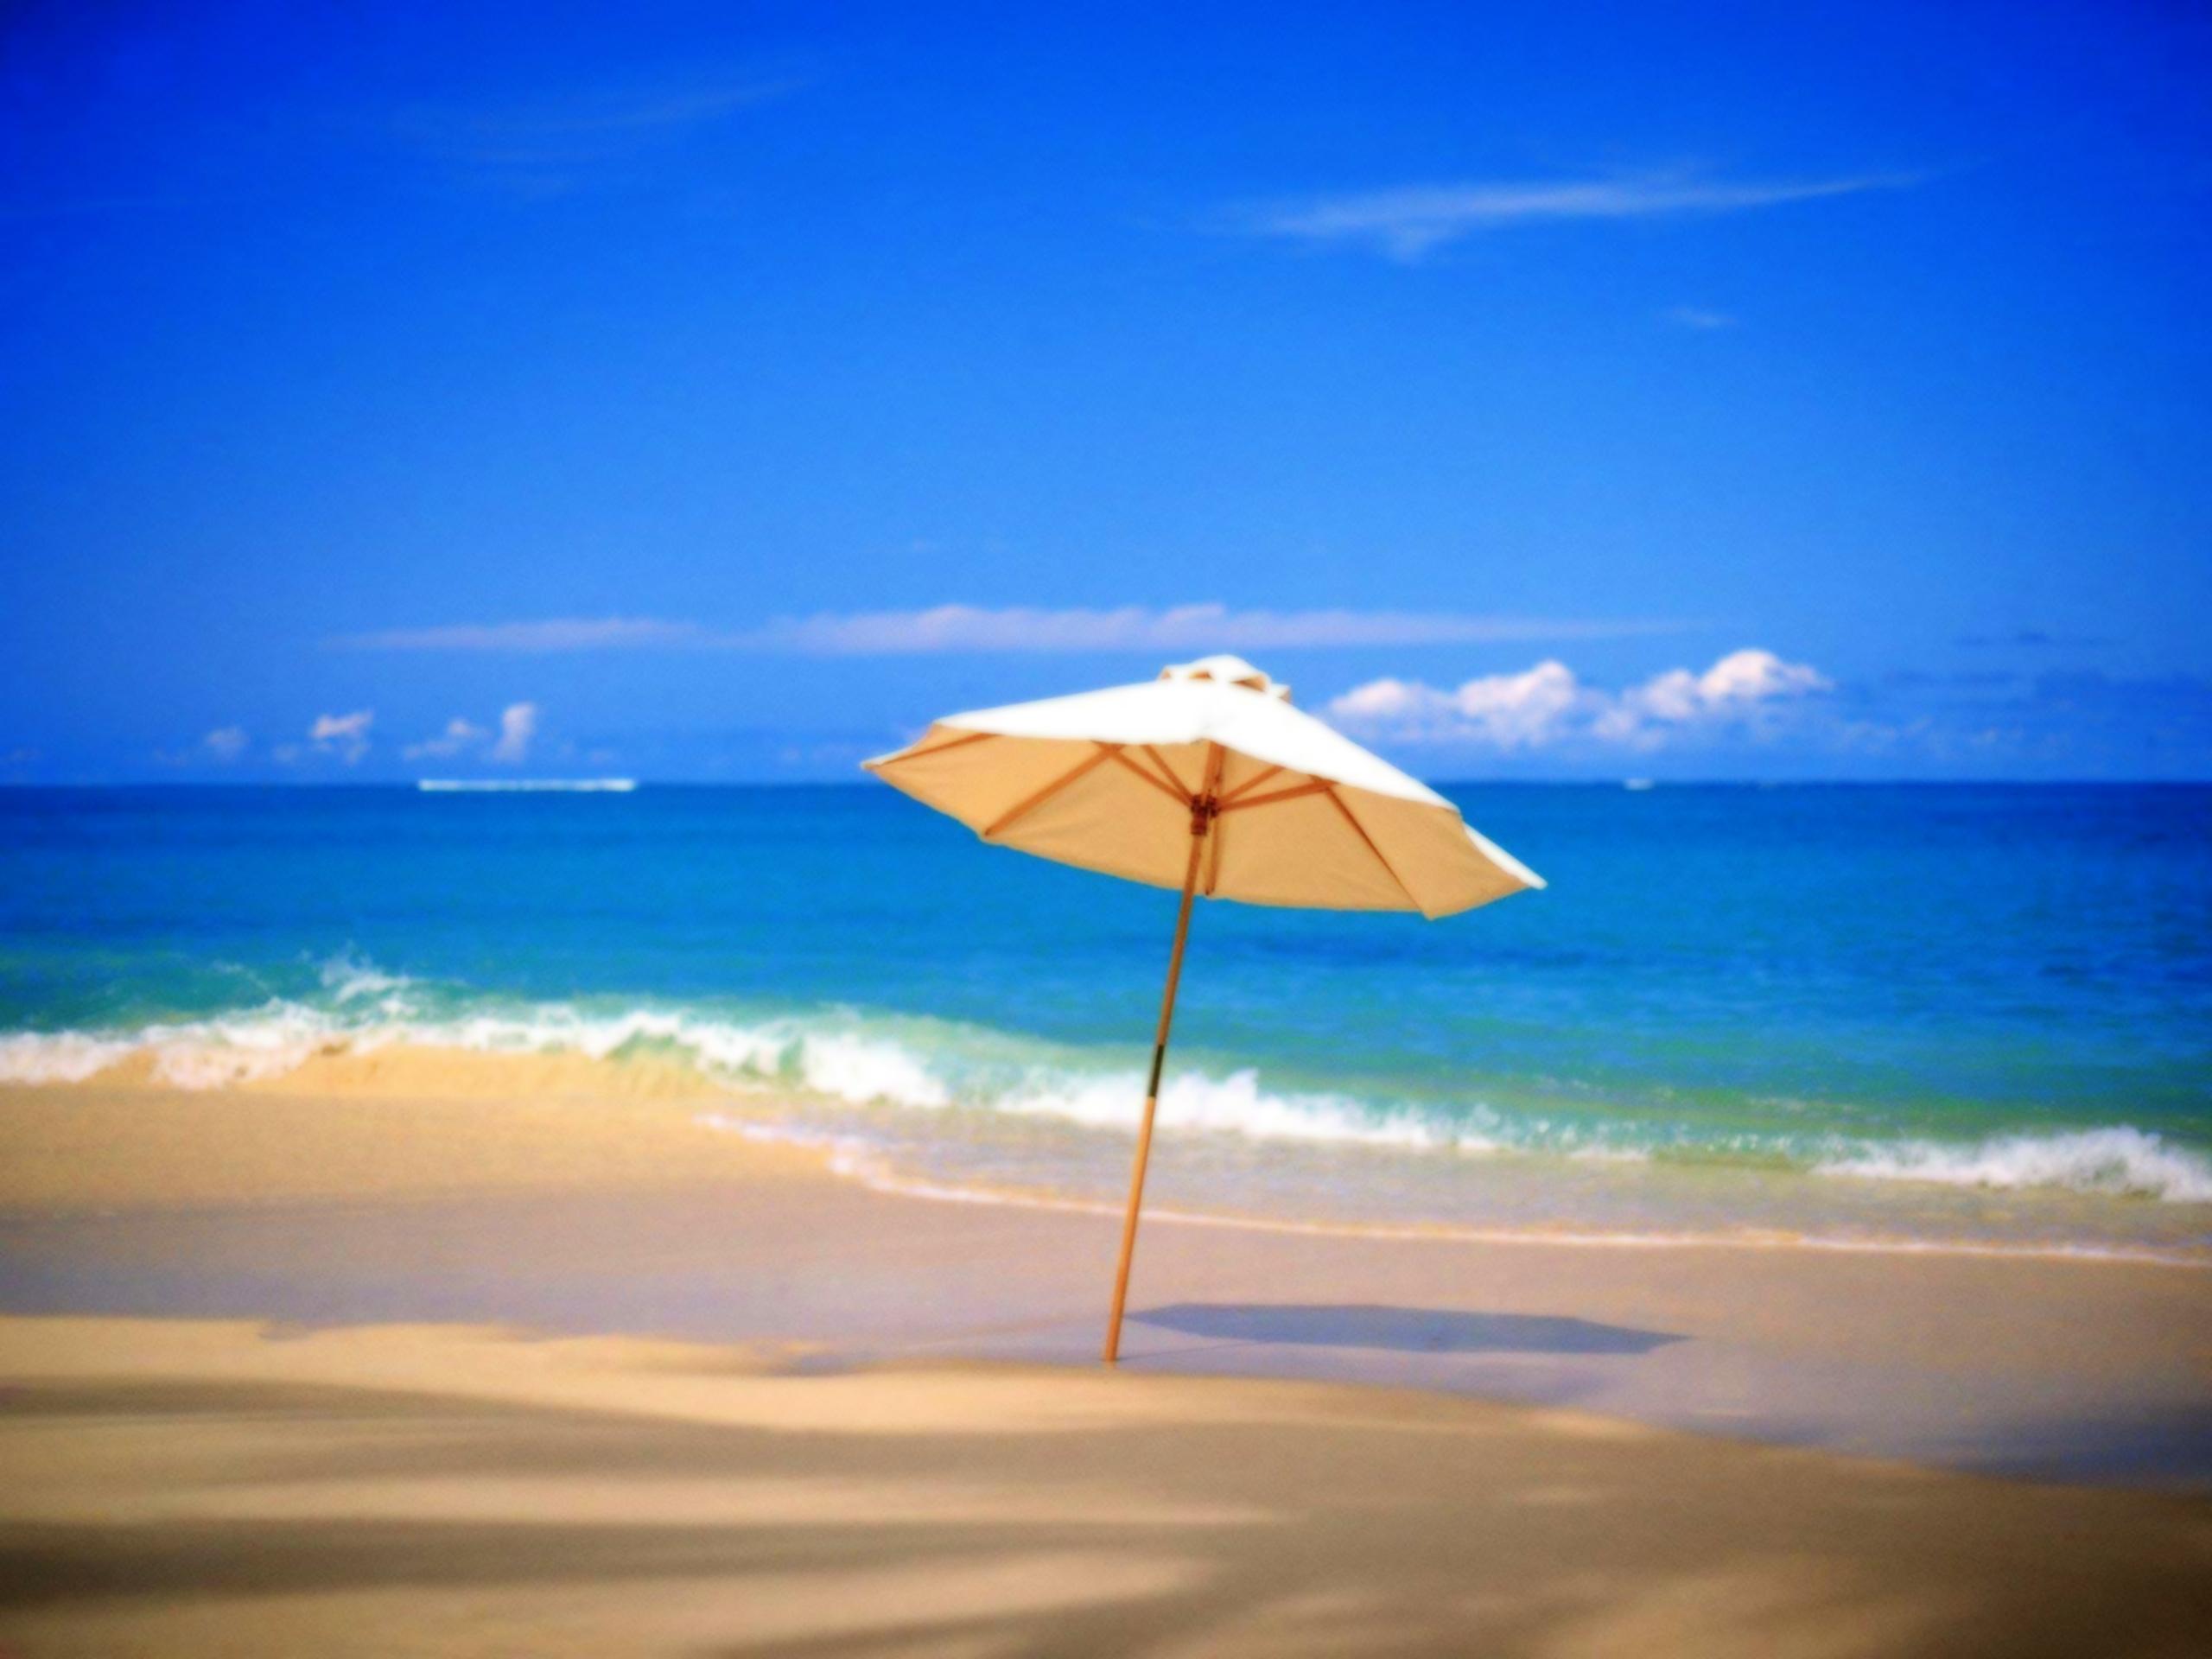 Beach Holidays Wallpaper Coastal Holiday Sand Beach